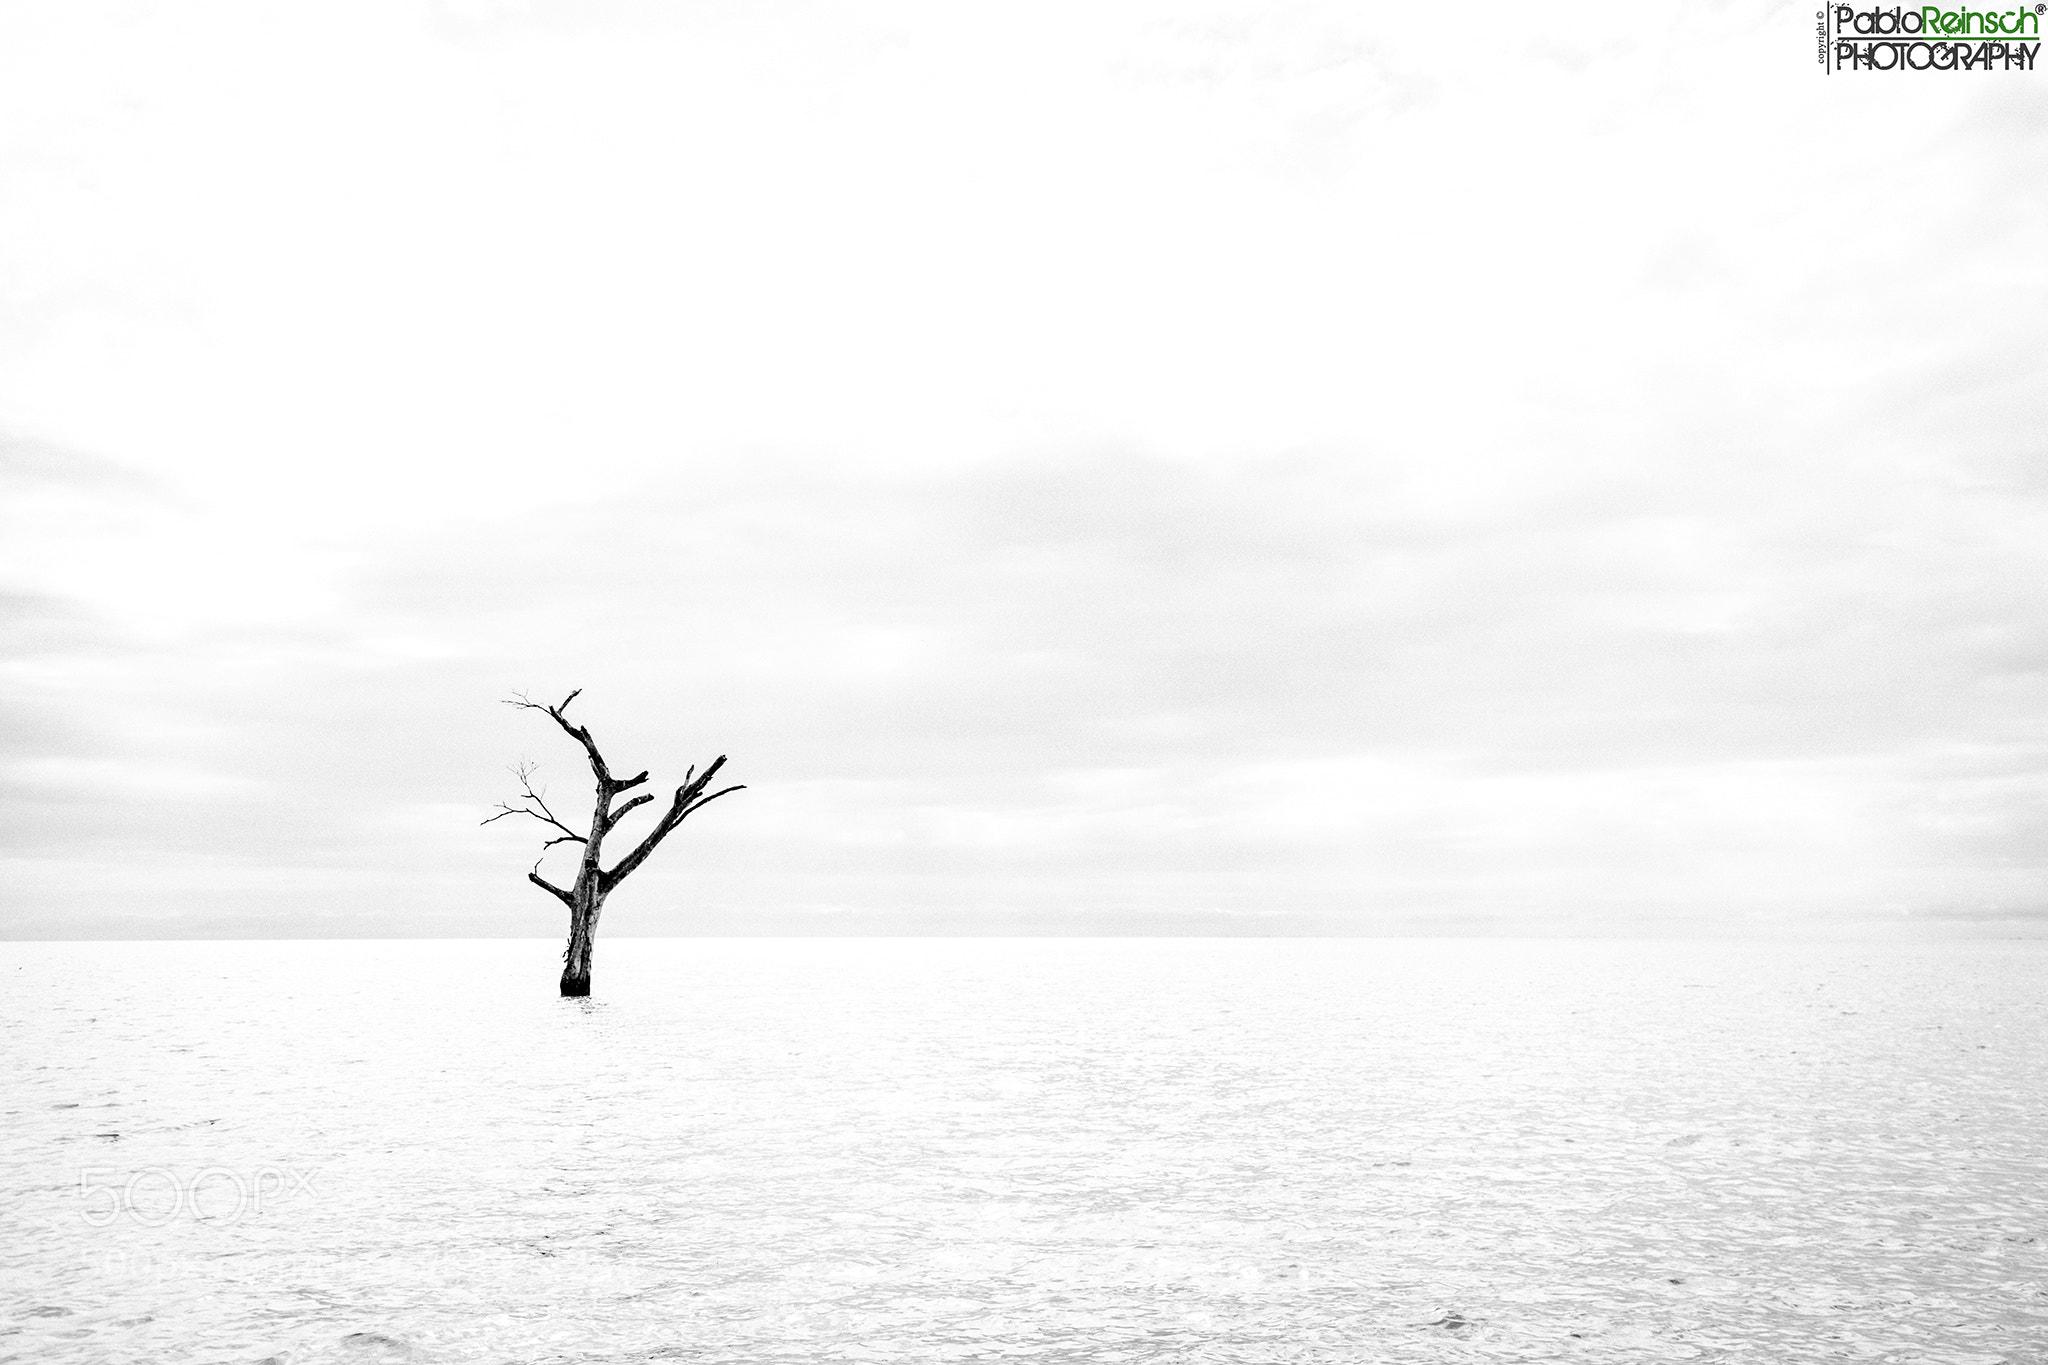 Photograph Soledad.- by Pablo Reinsch on 500px